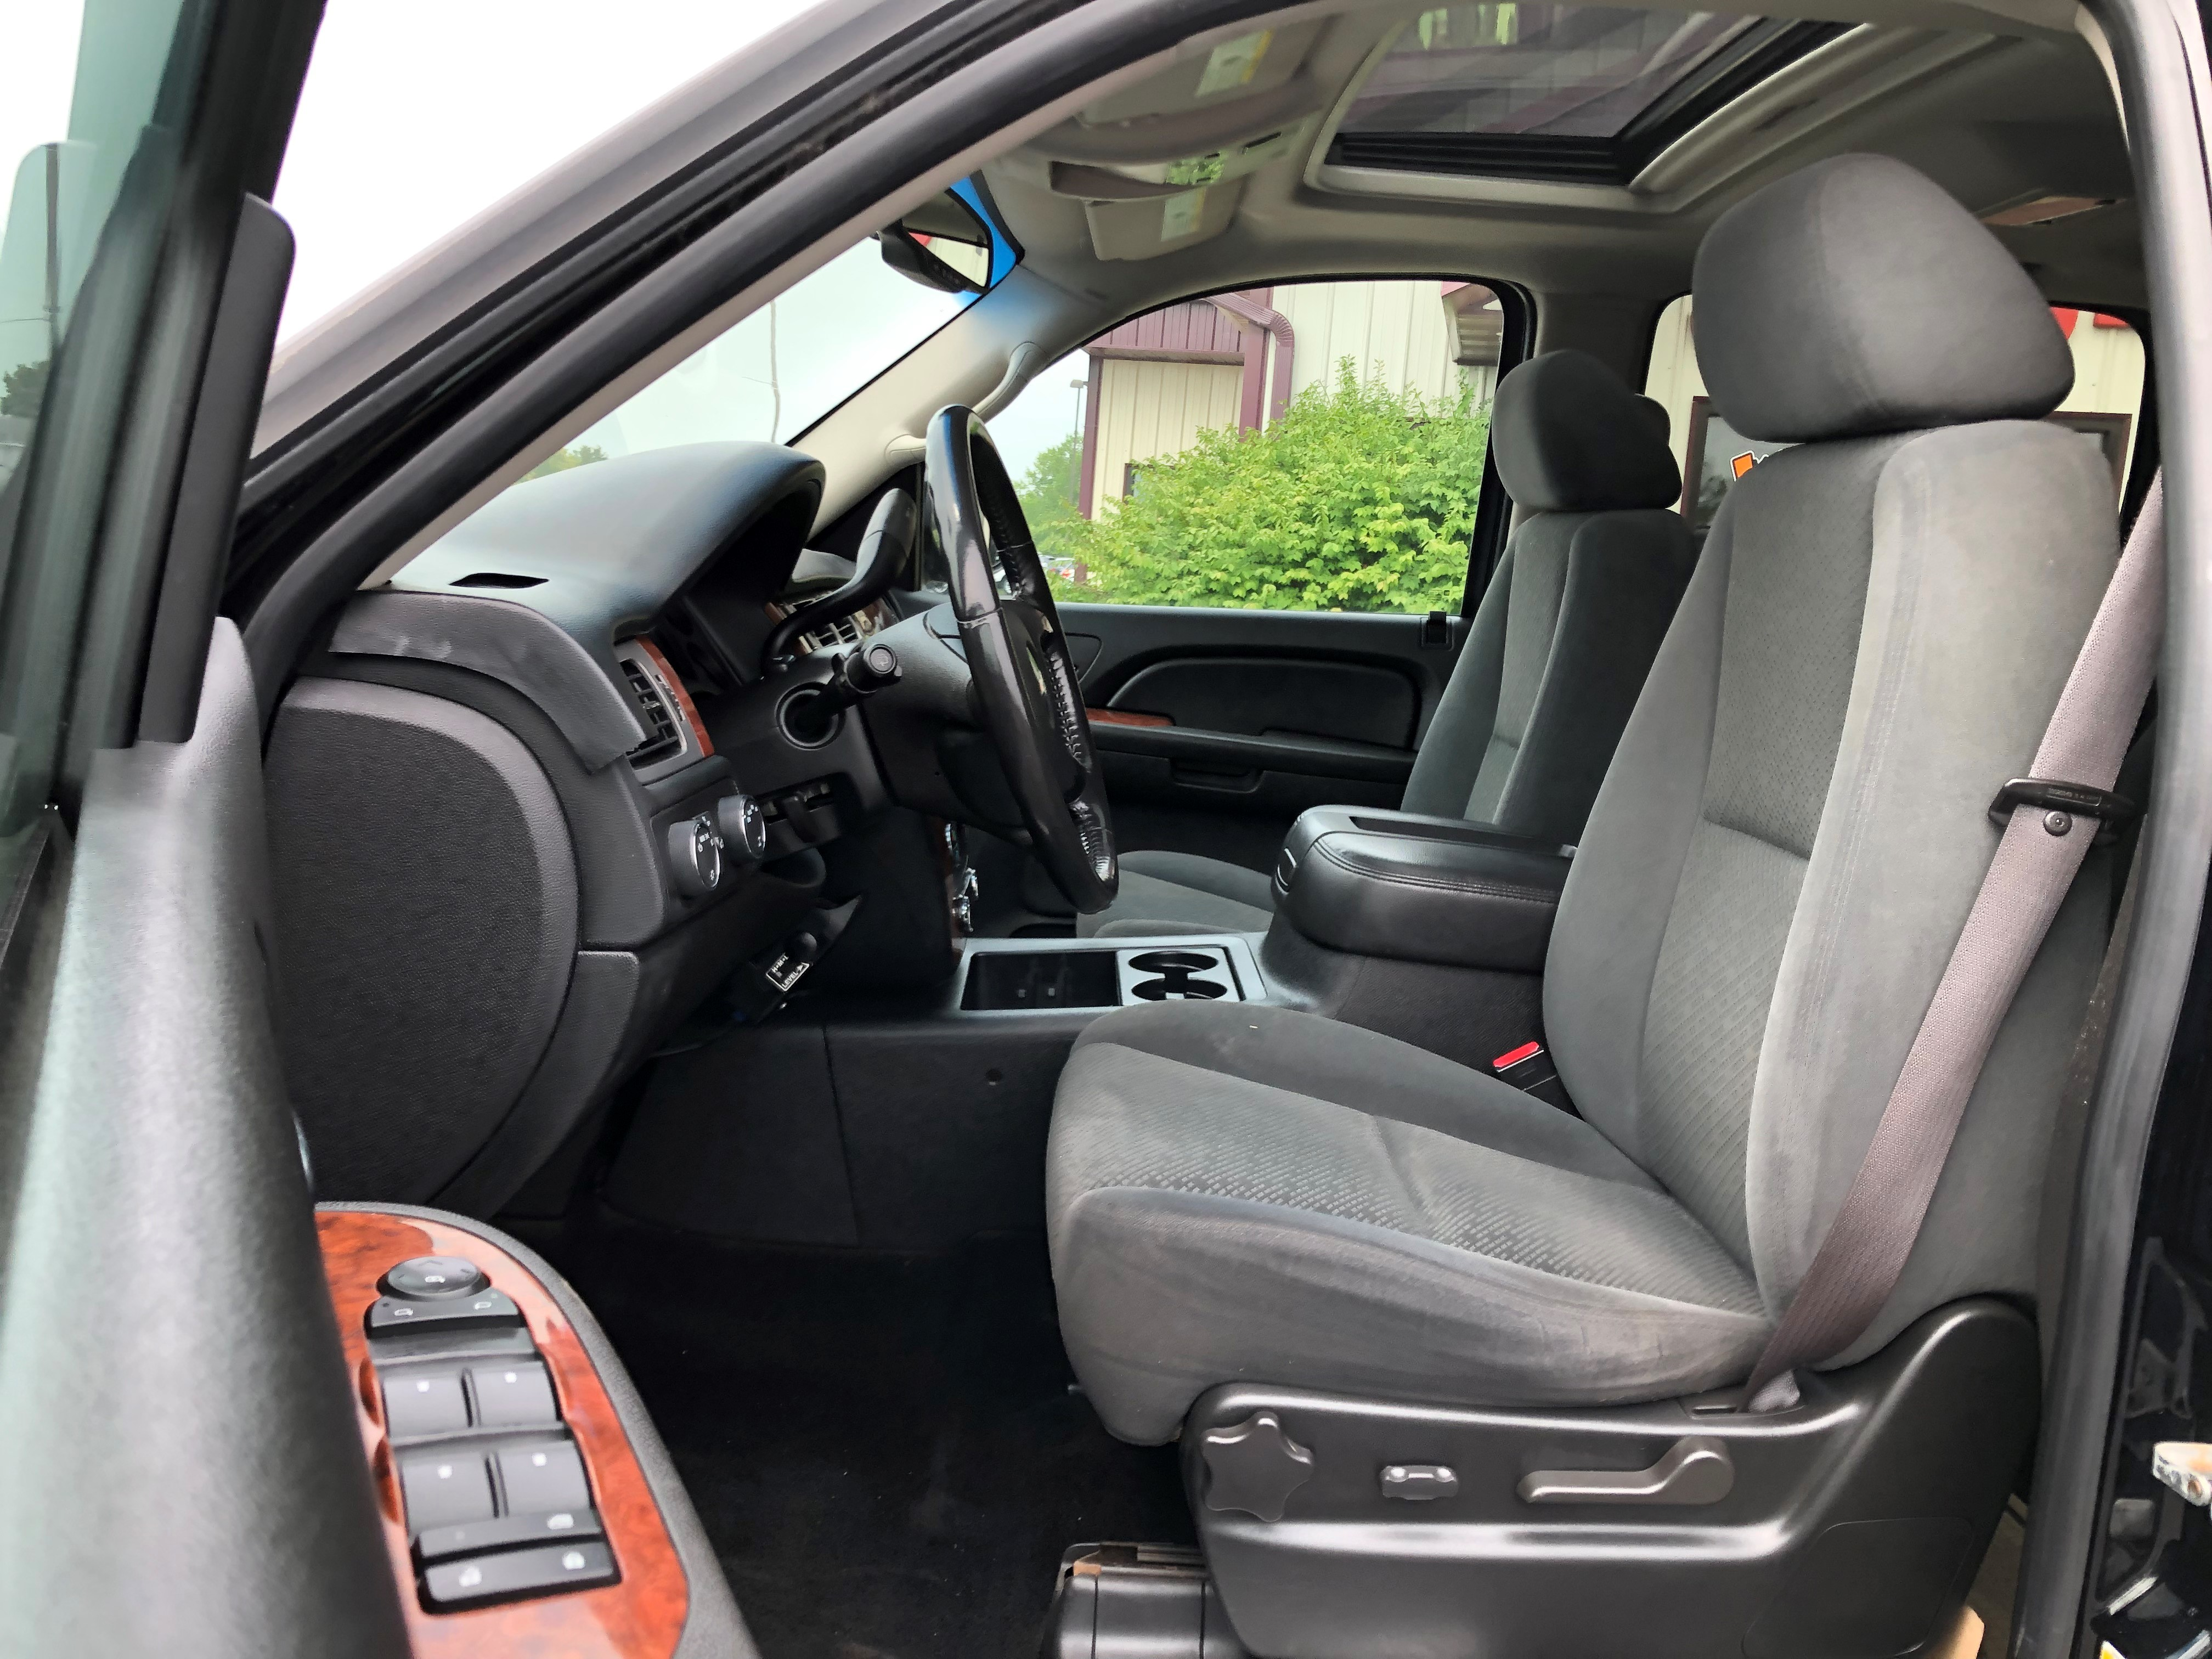 used vehicle - SUV CHEVROLET SUBURBAN 2008